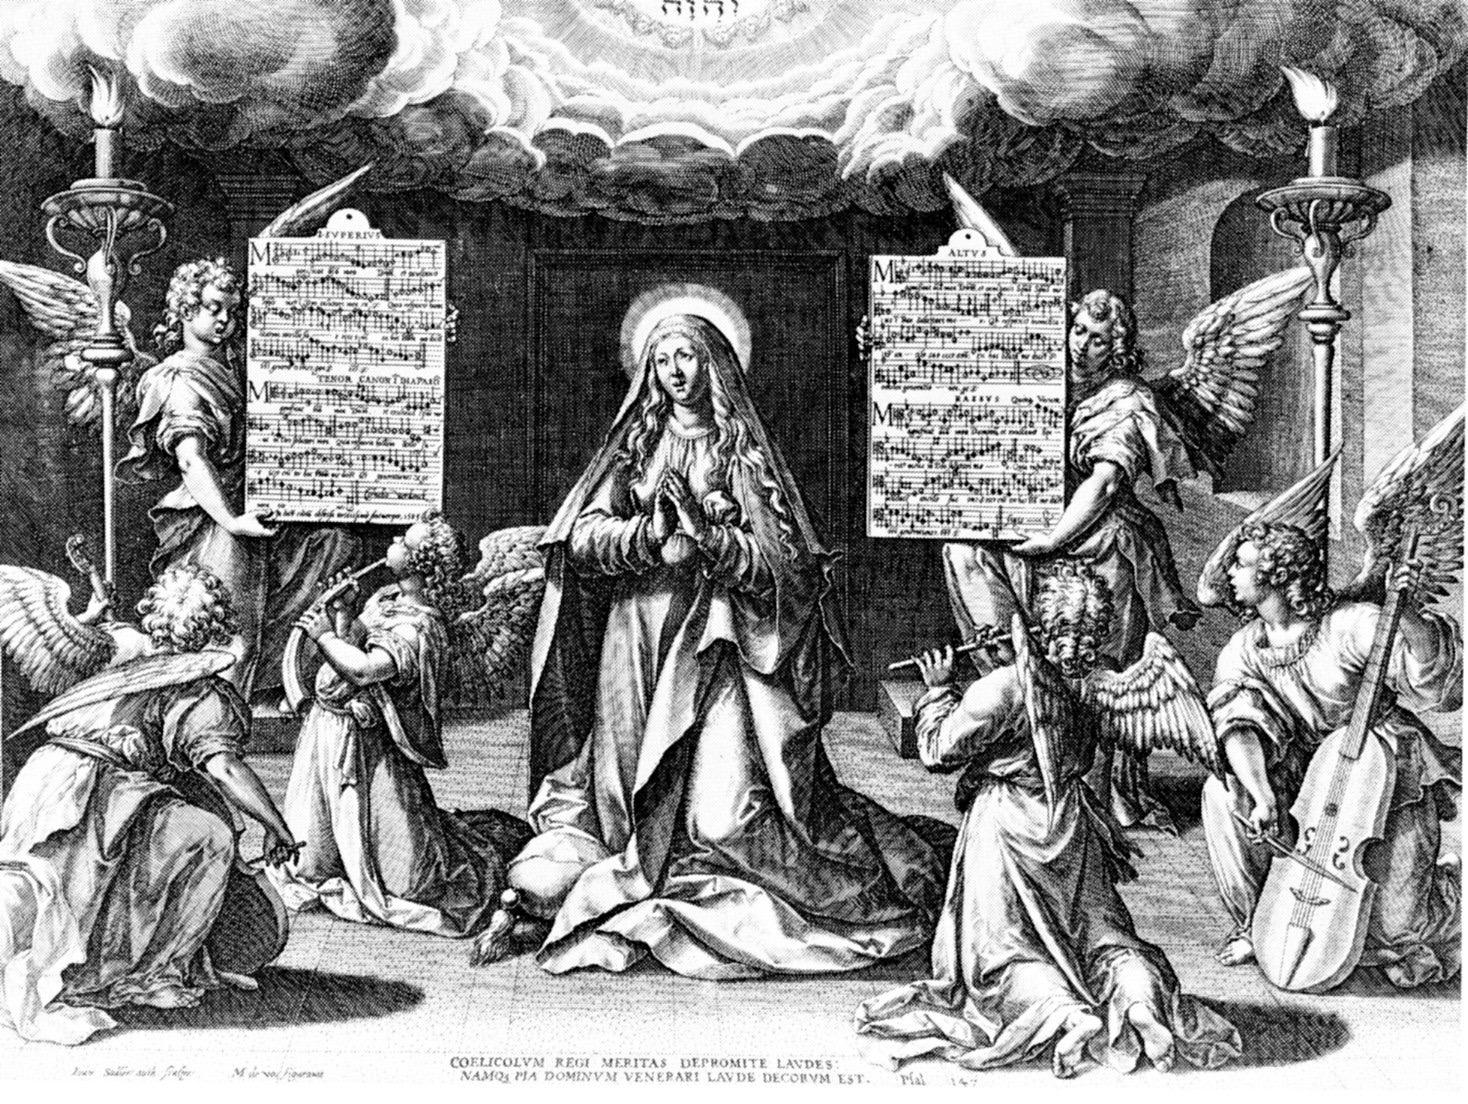 Engraving by Martijn de Vos and Jan Sadeleer Magnificat